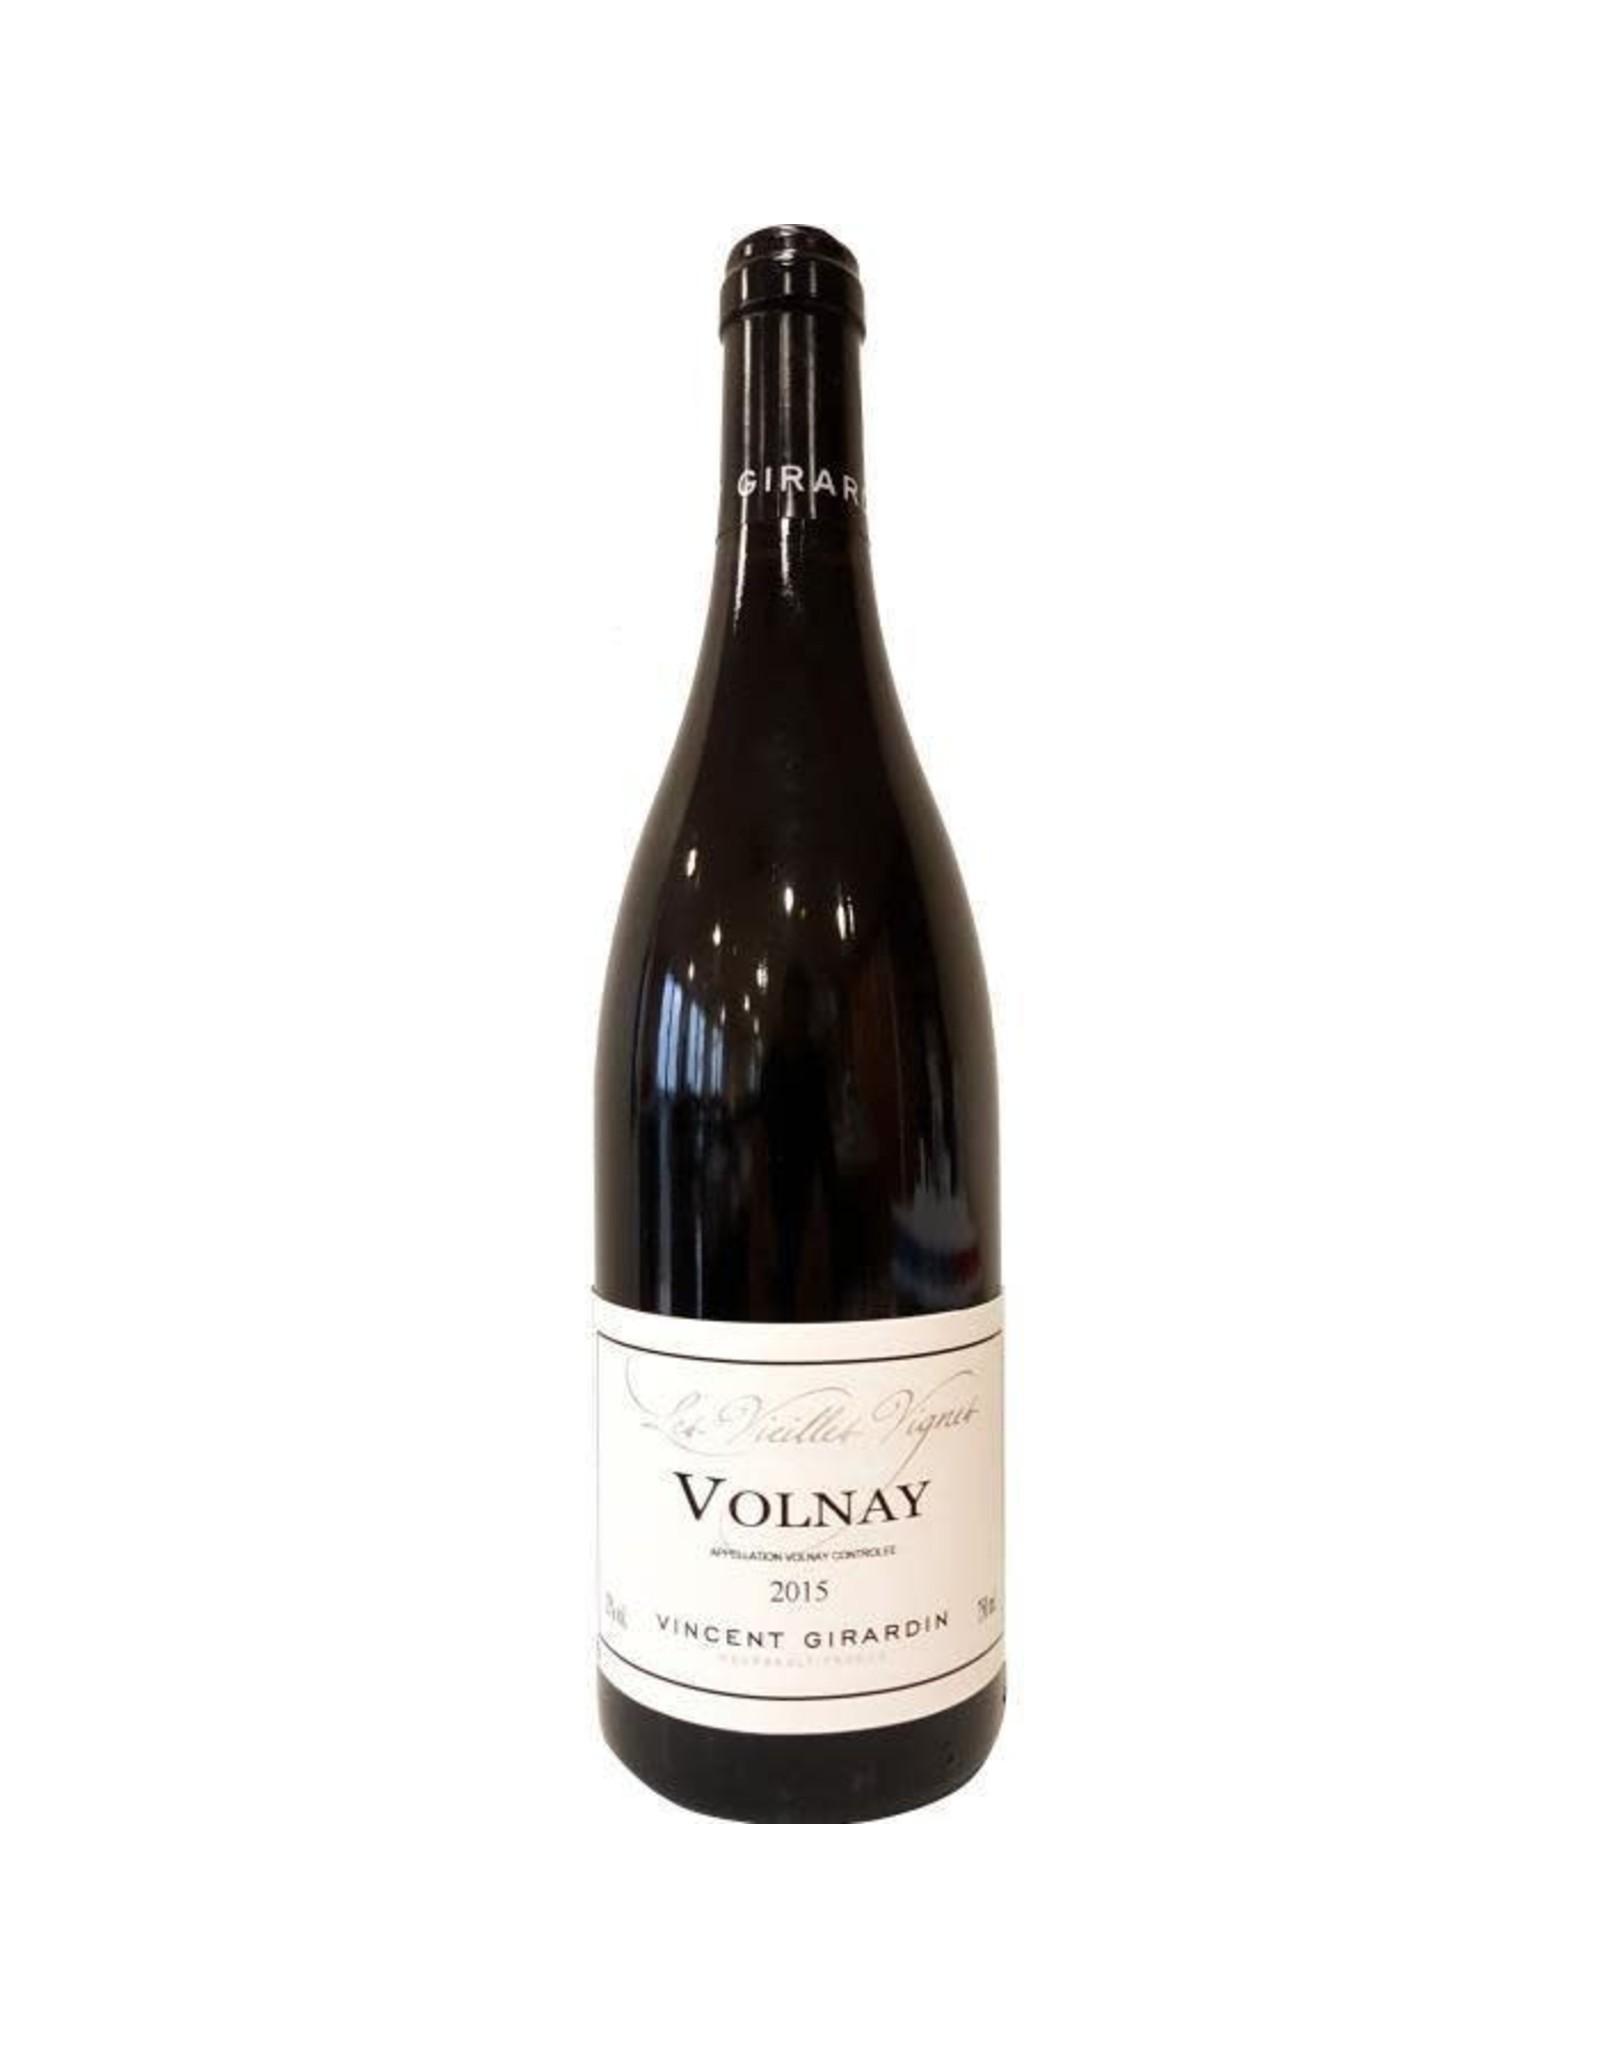 Girardin Volnay Vieilles Vigne 2015